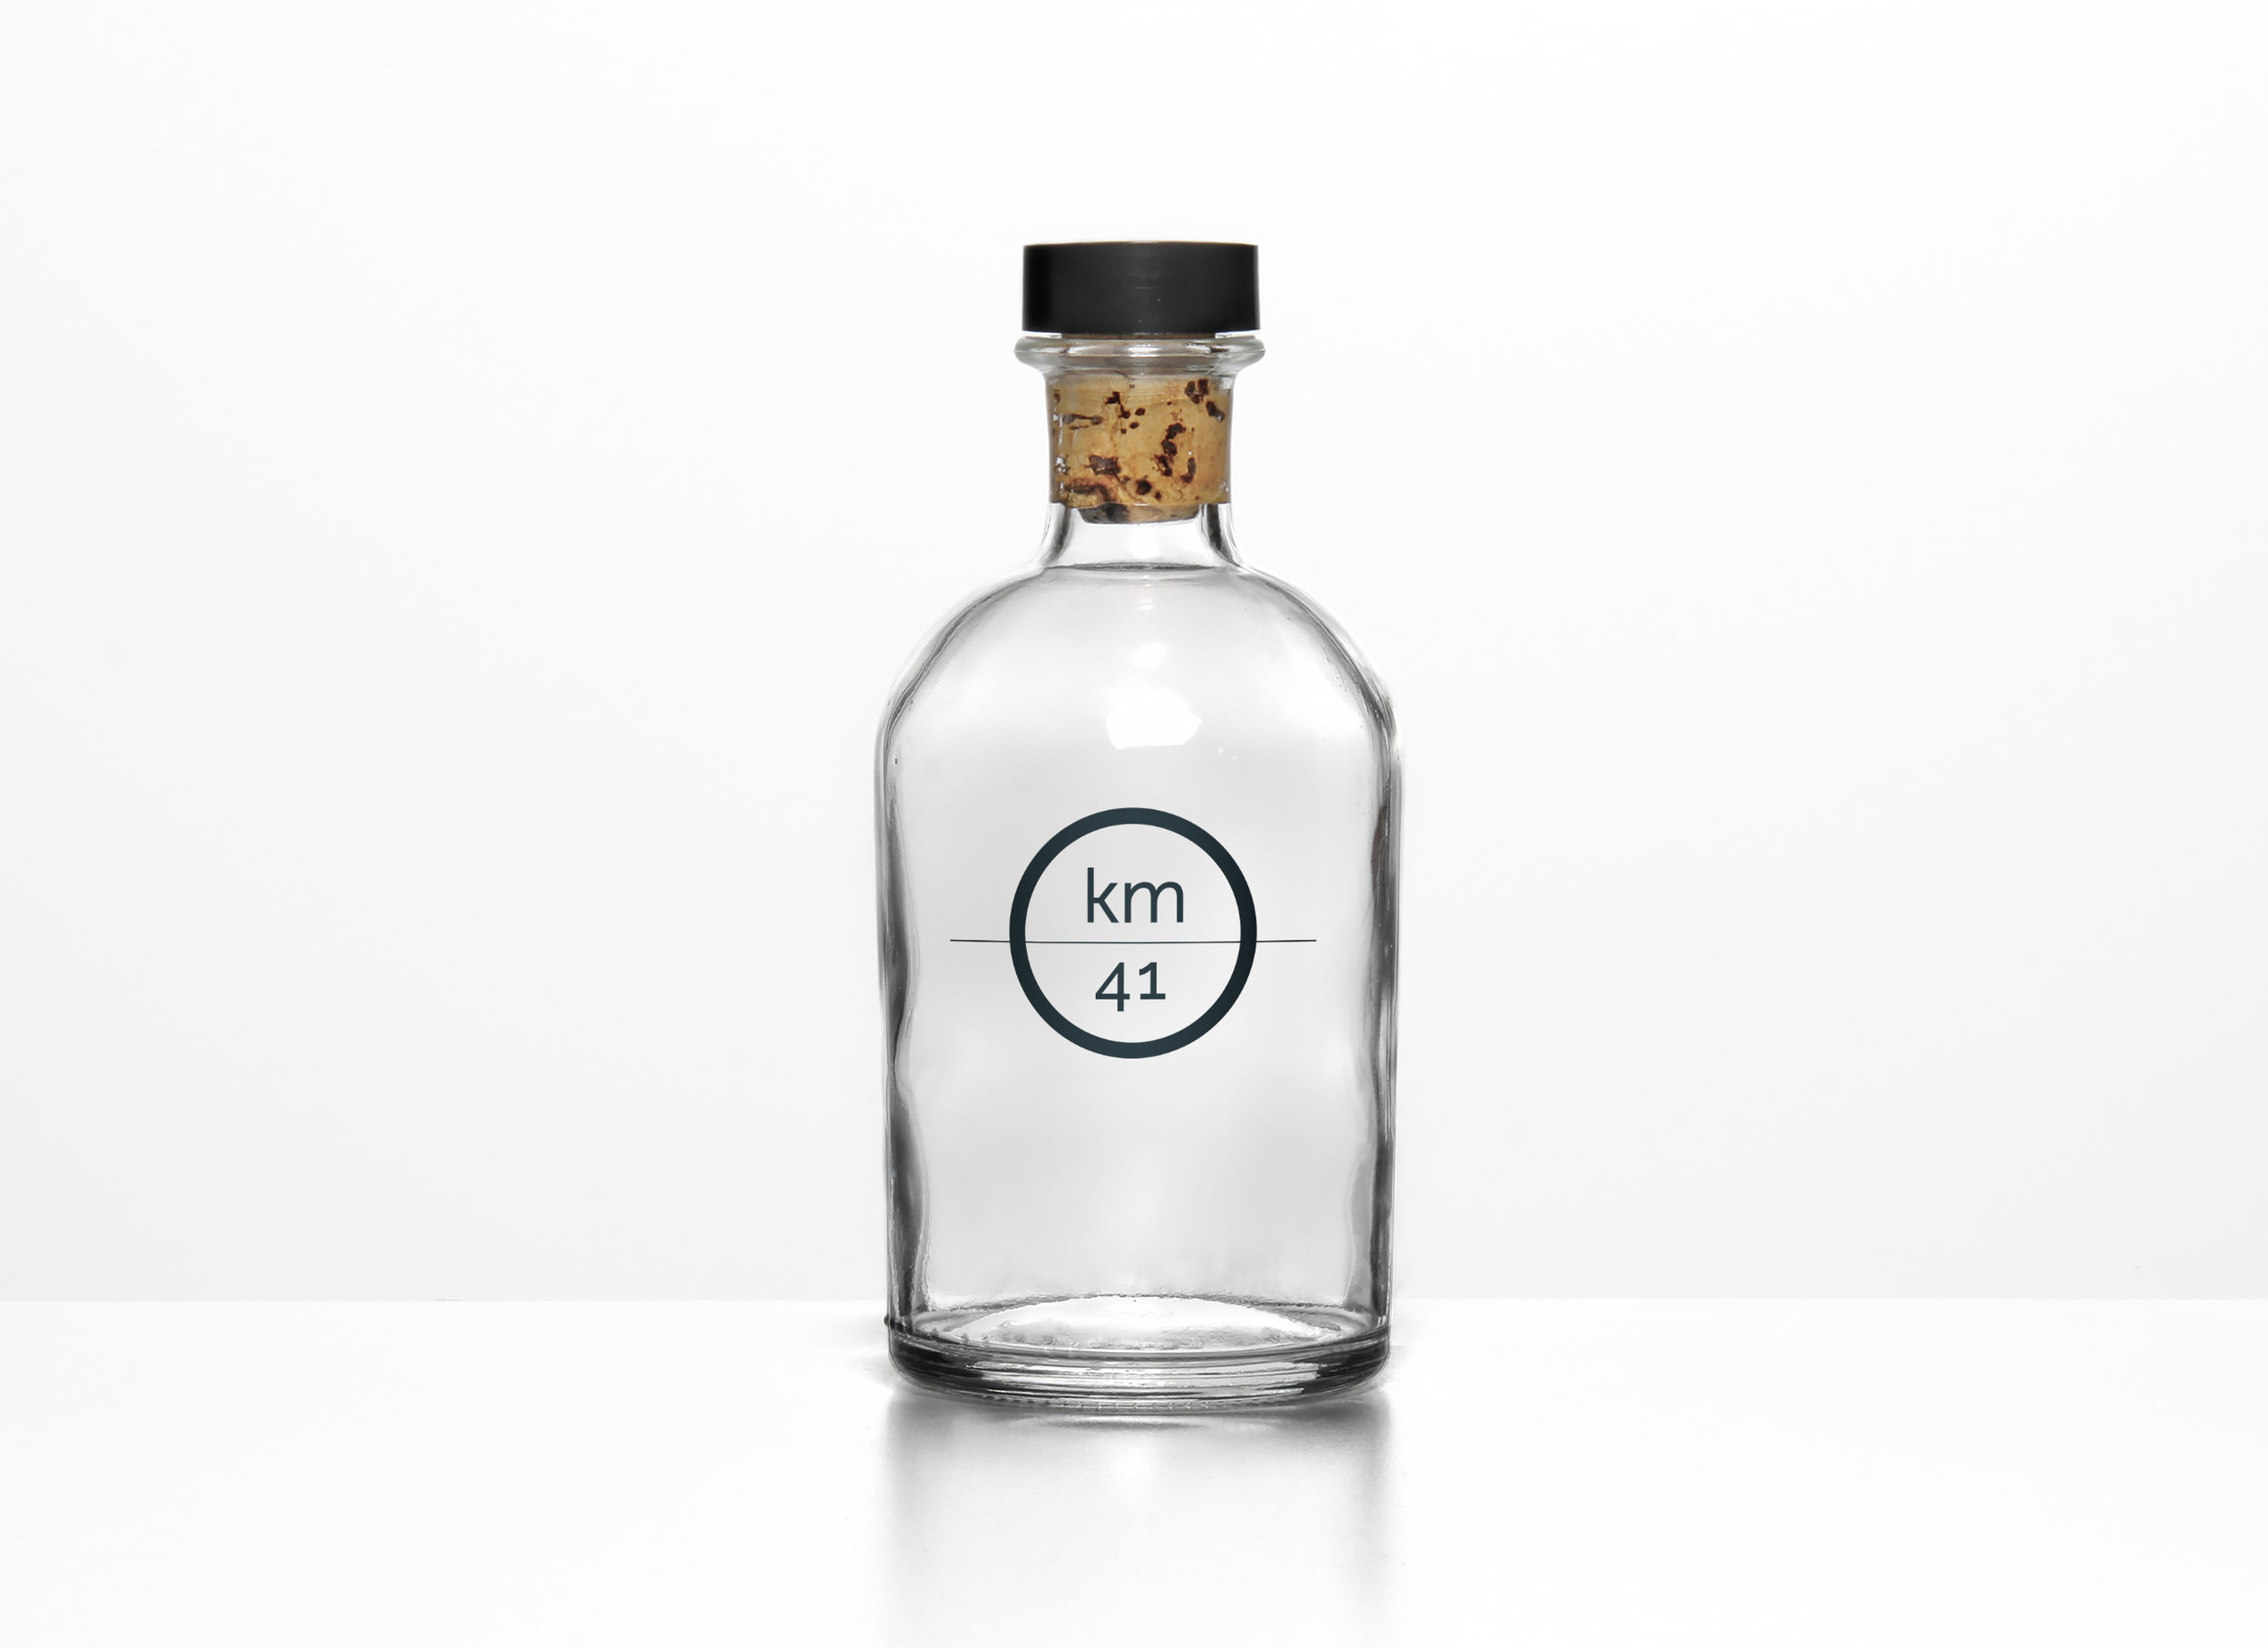 Versatile-Bottle-MockUp.jpg